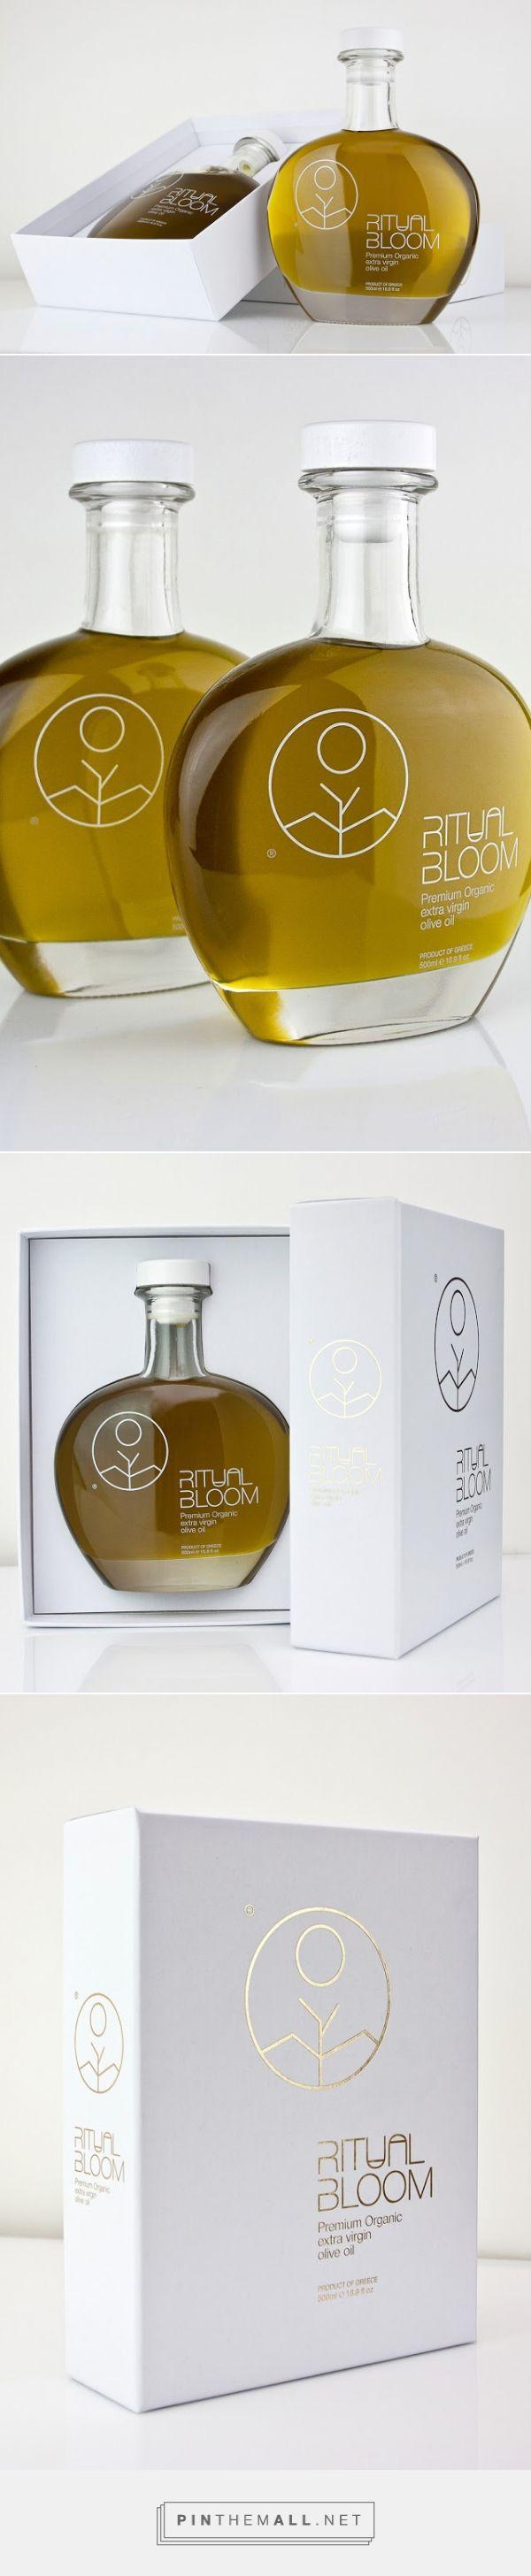 Ritual Bloom Premium Extra Virgin Olive Oil